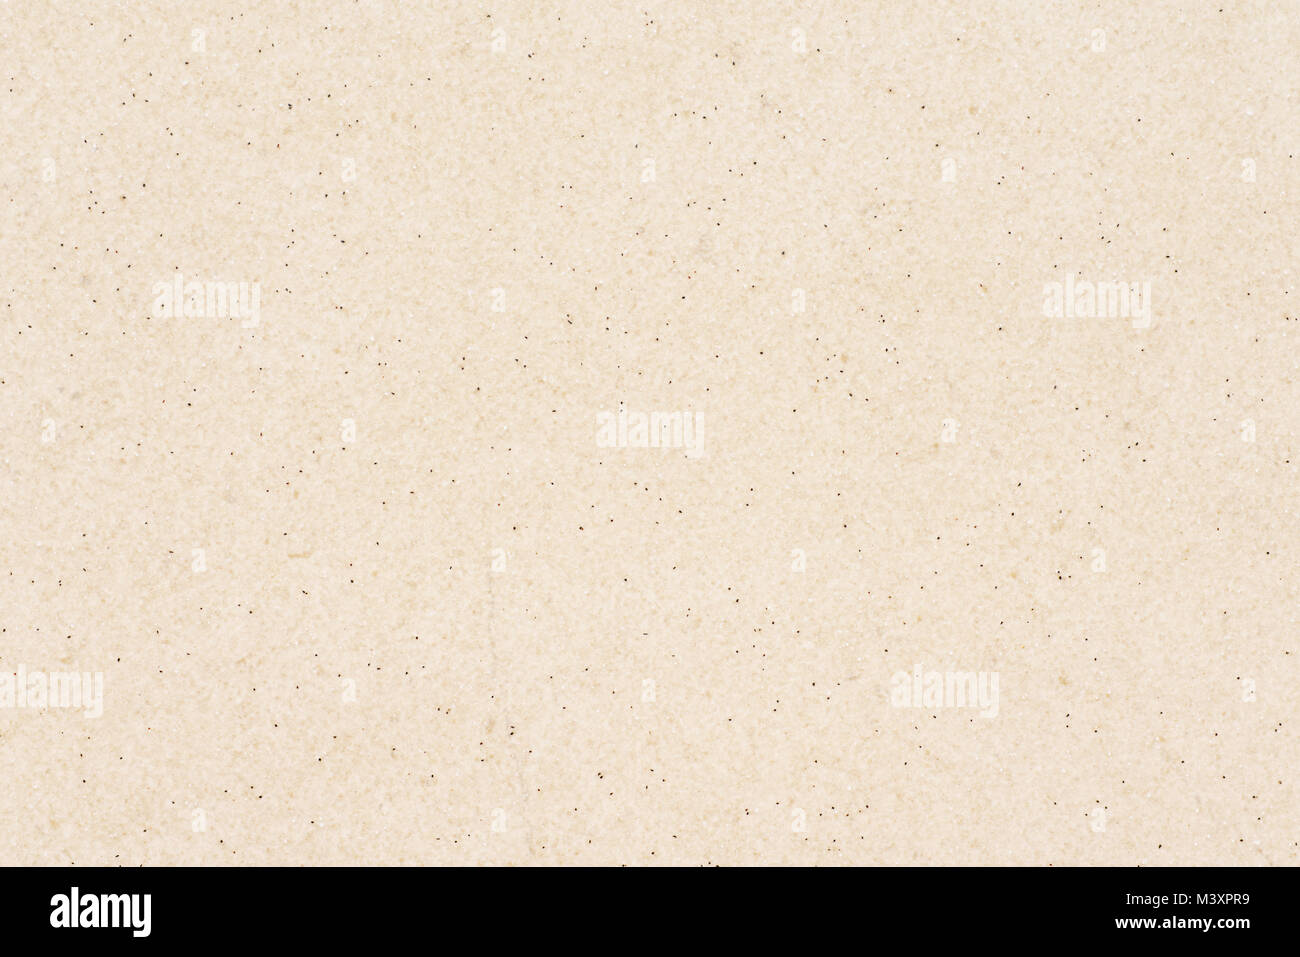 Ceramica gres porcellanato piastrella o texture pattern. pietra